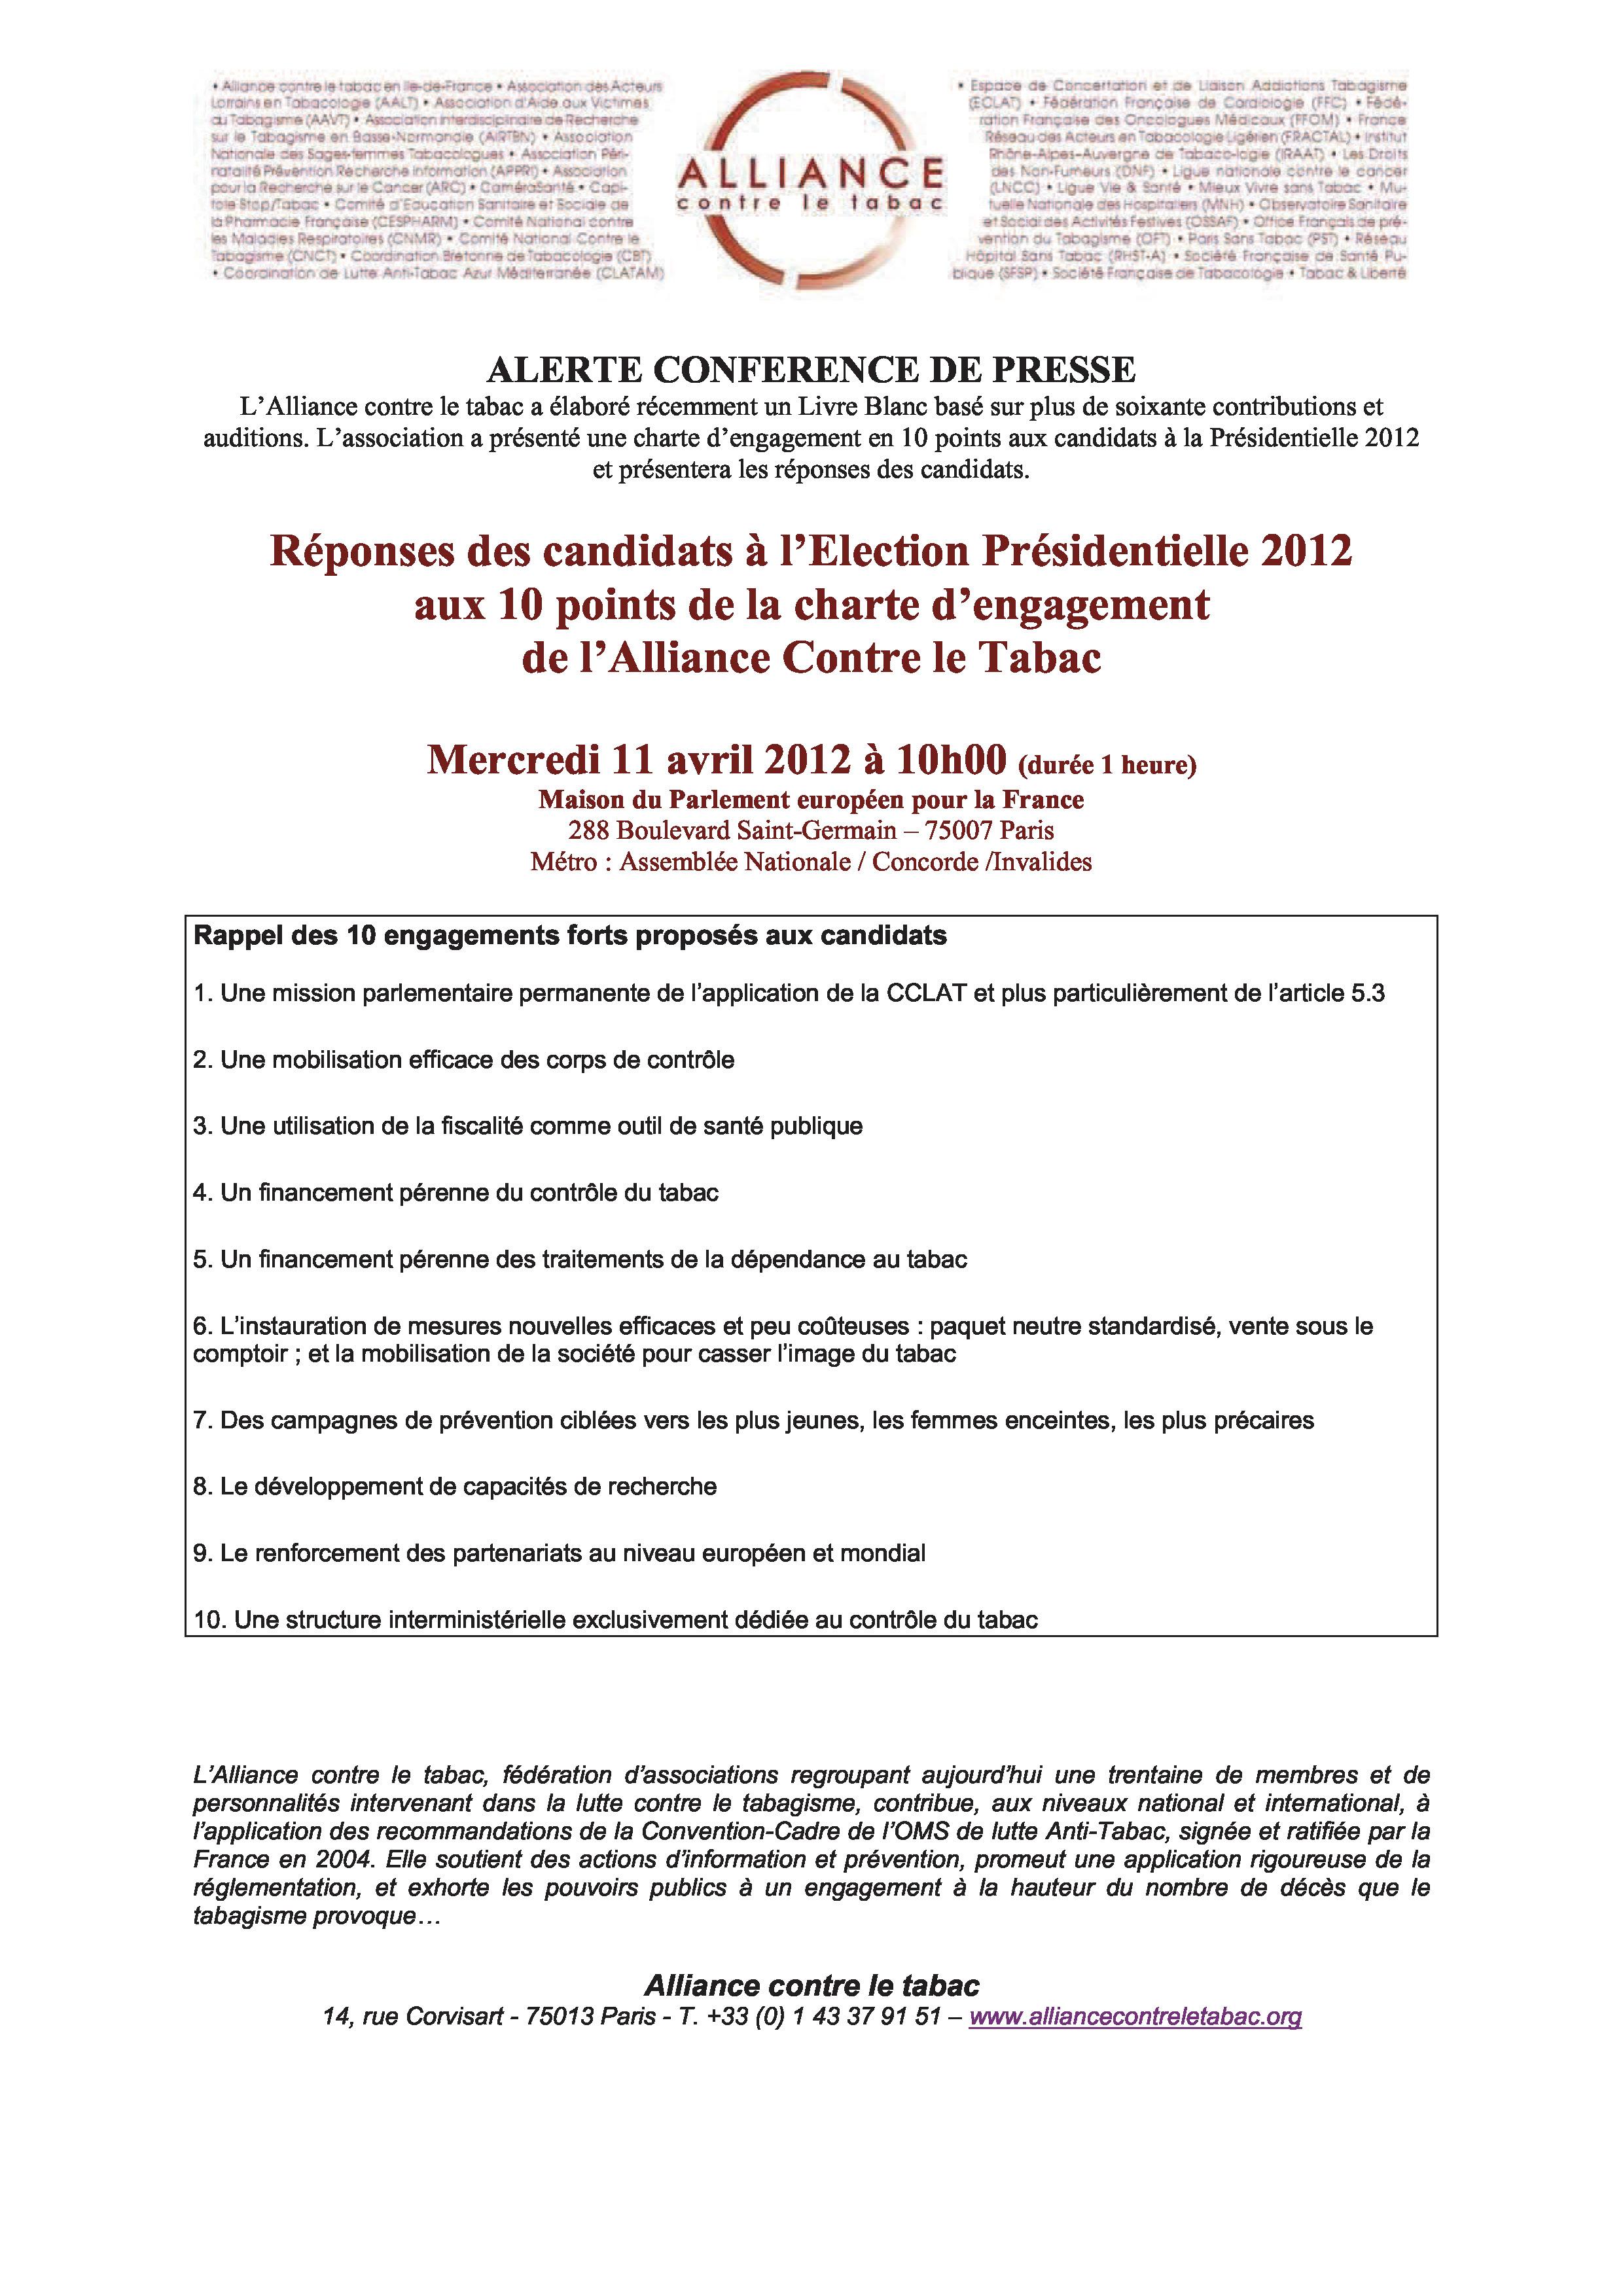 Alliance-dossier-presse-livre-blanc-11avr2012_Page_01.jpg